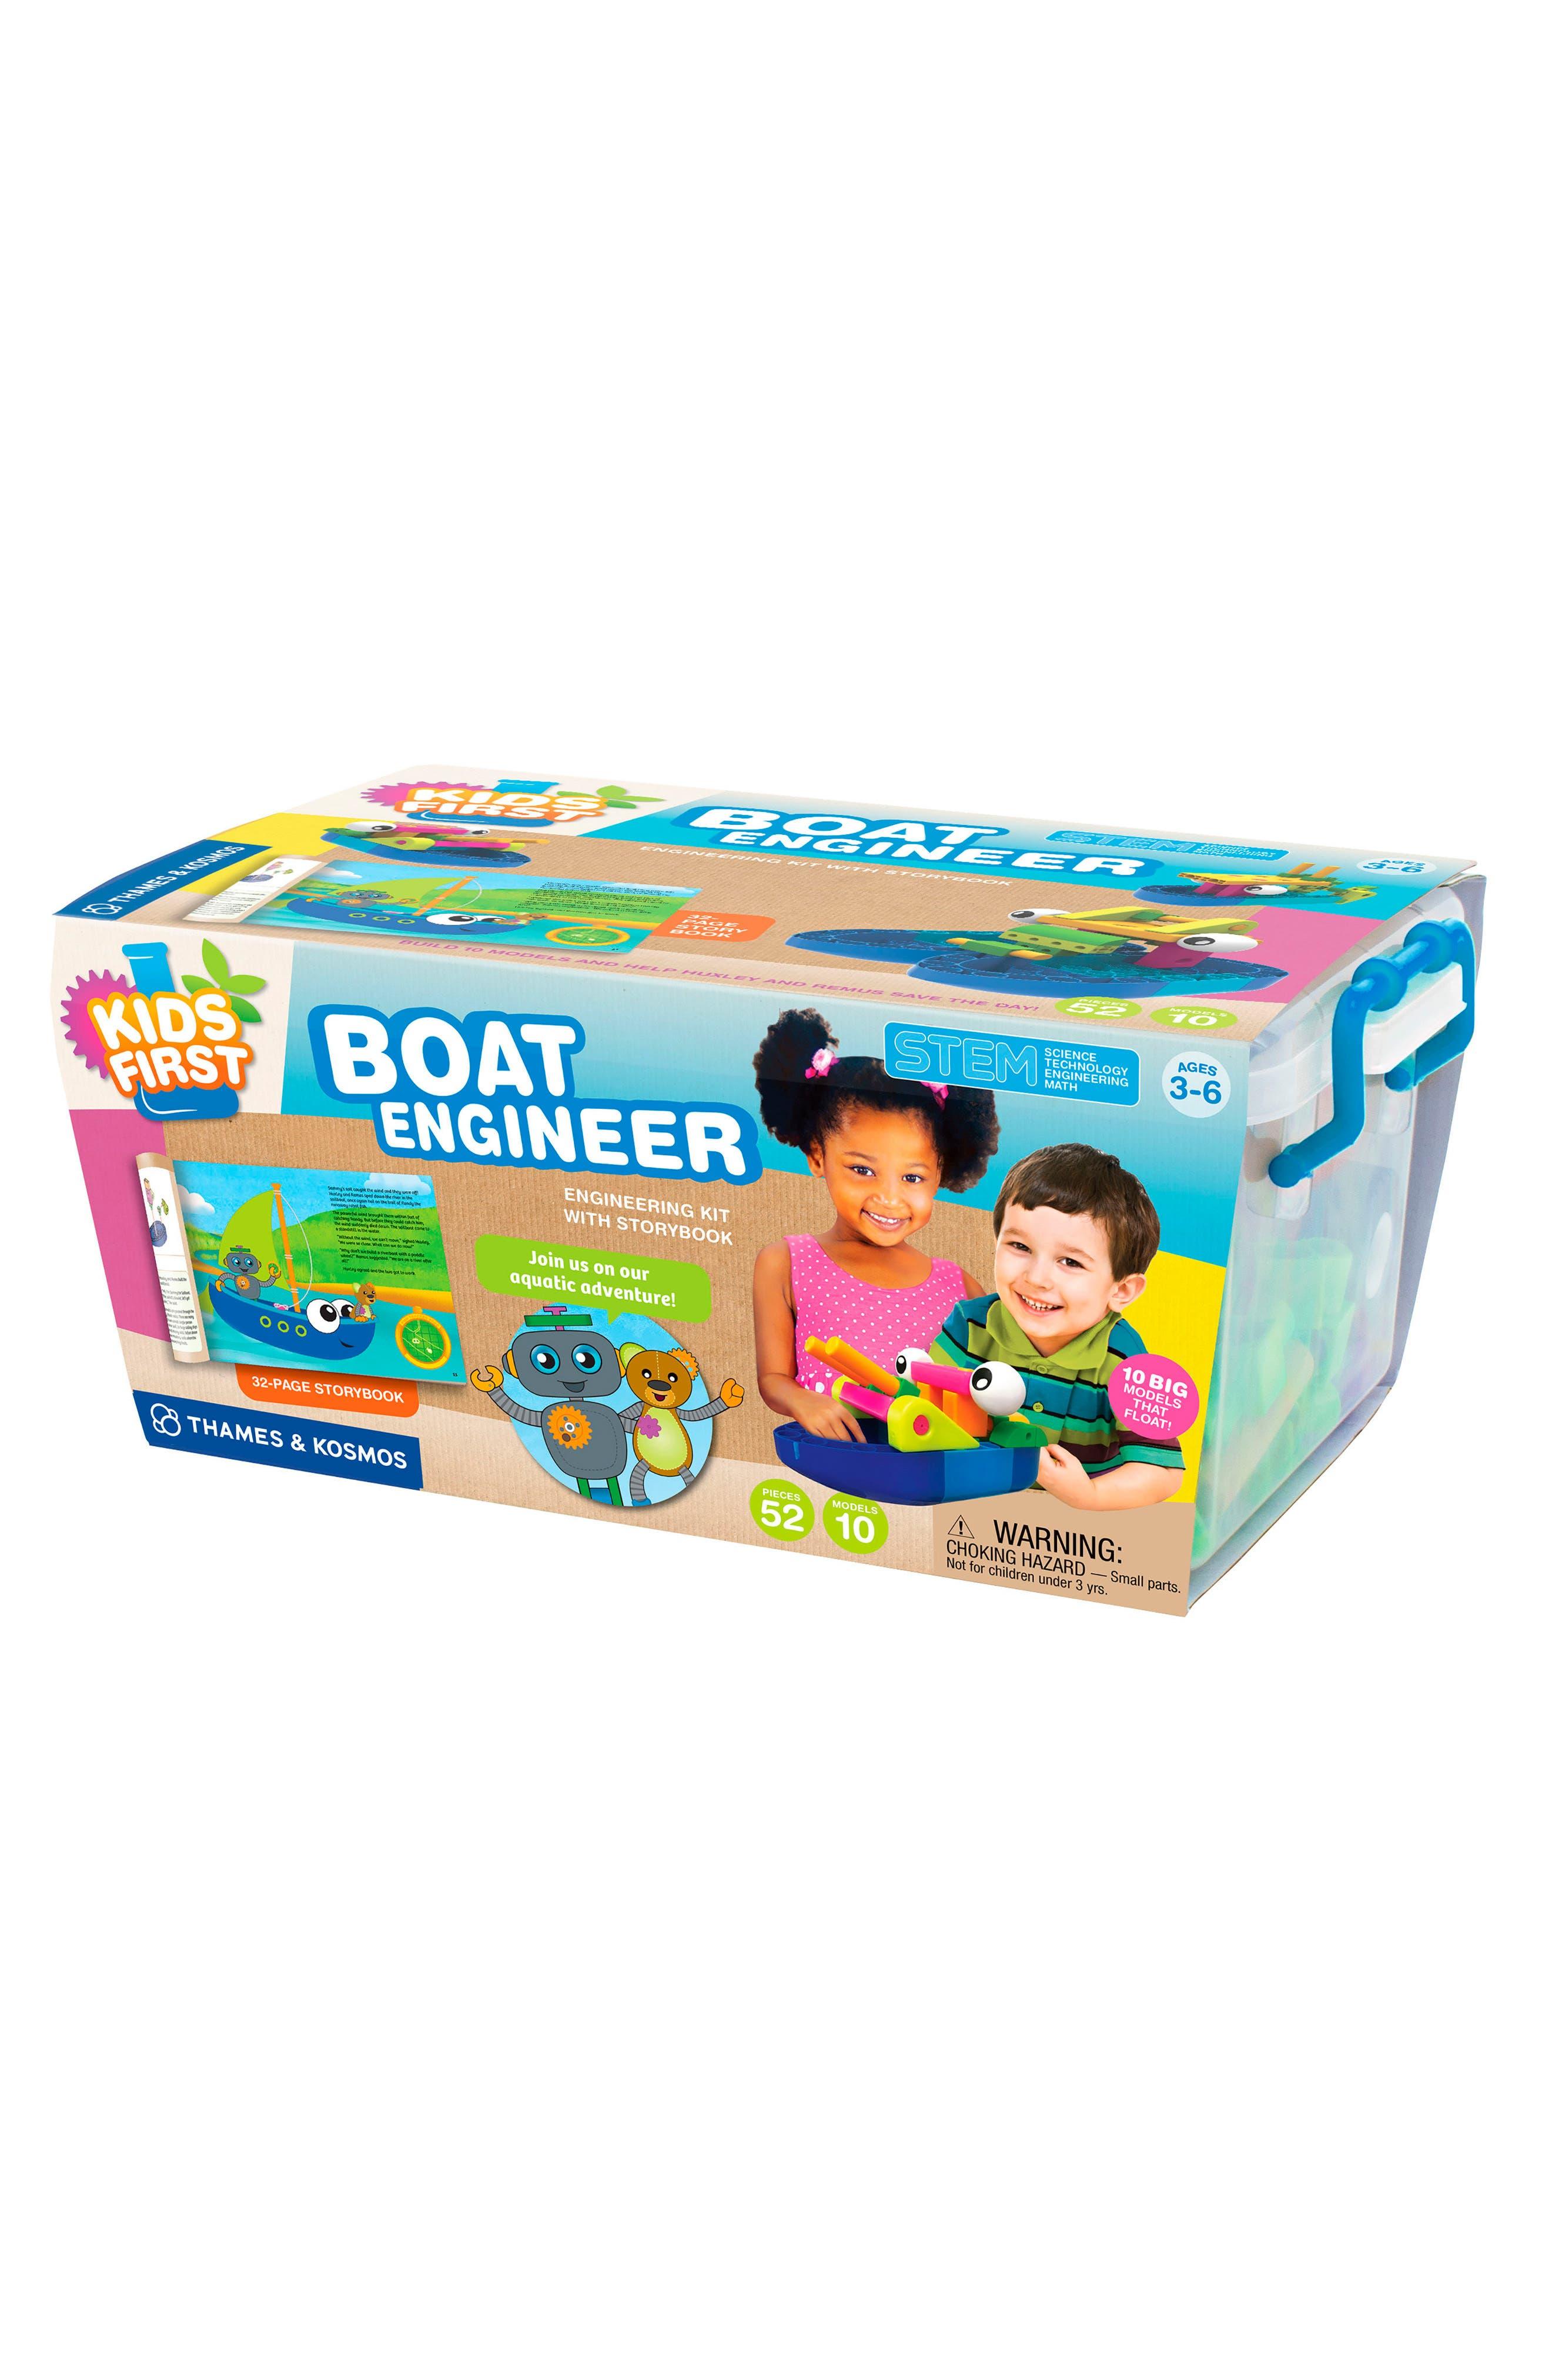 Thames & Kosmos Boat Engineer Kit with Storybook